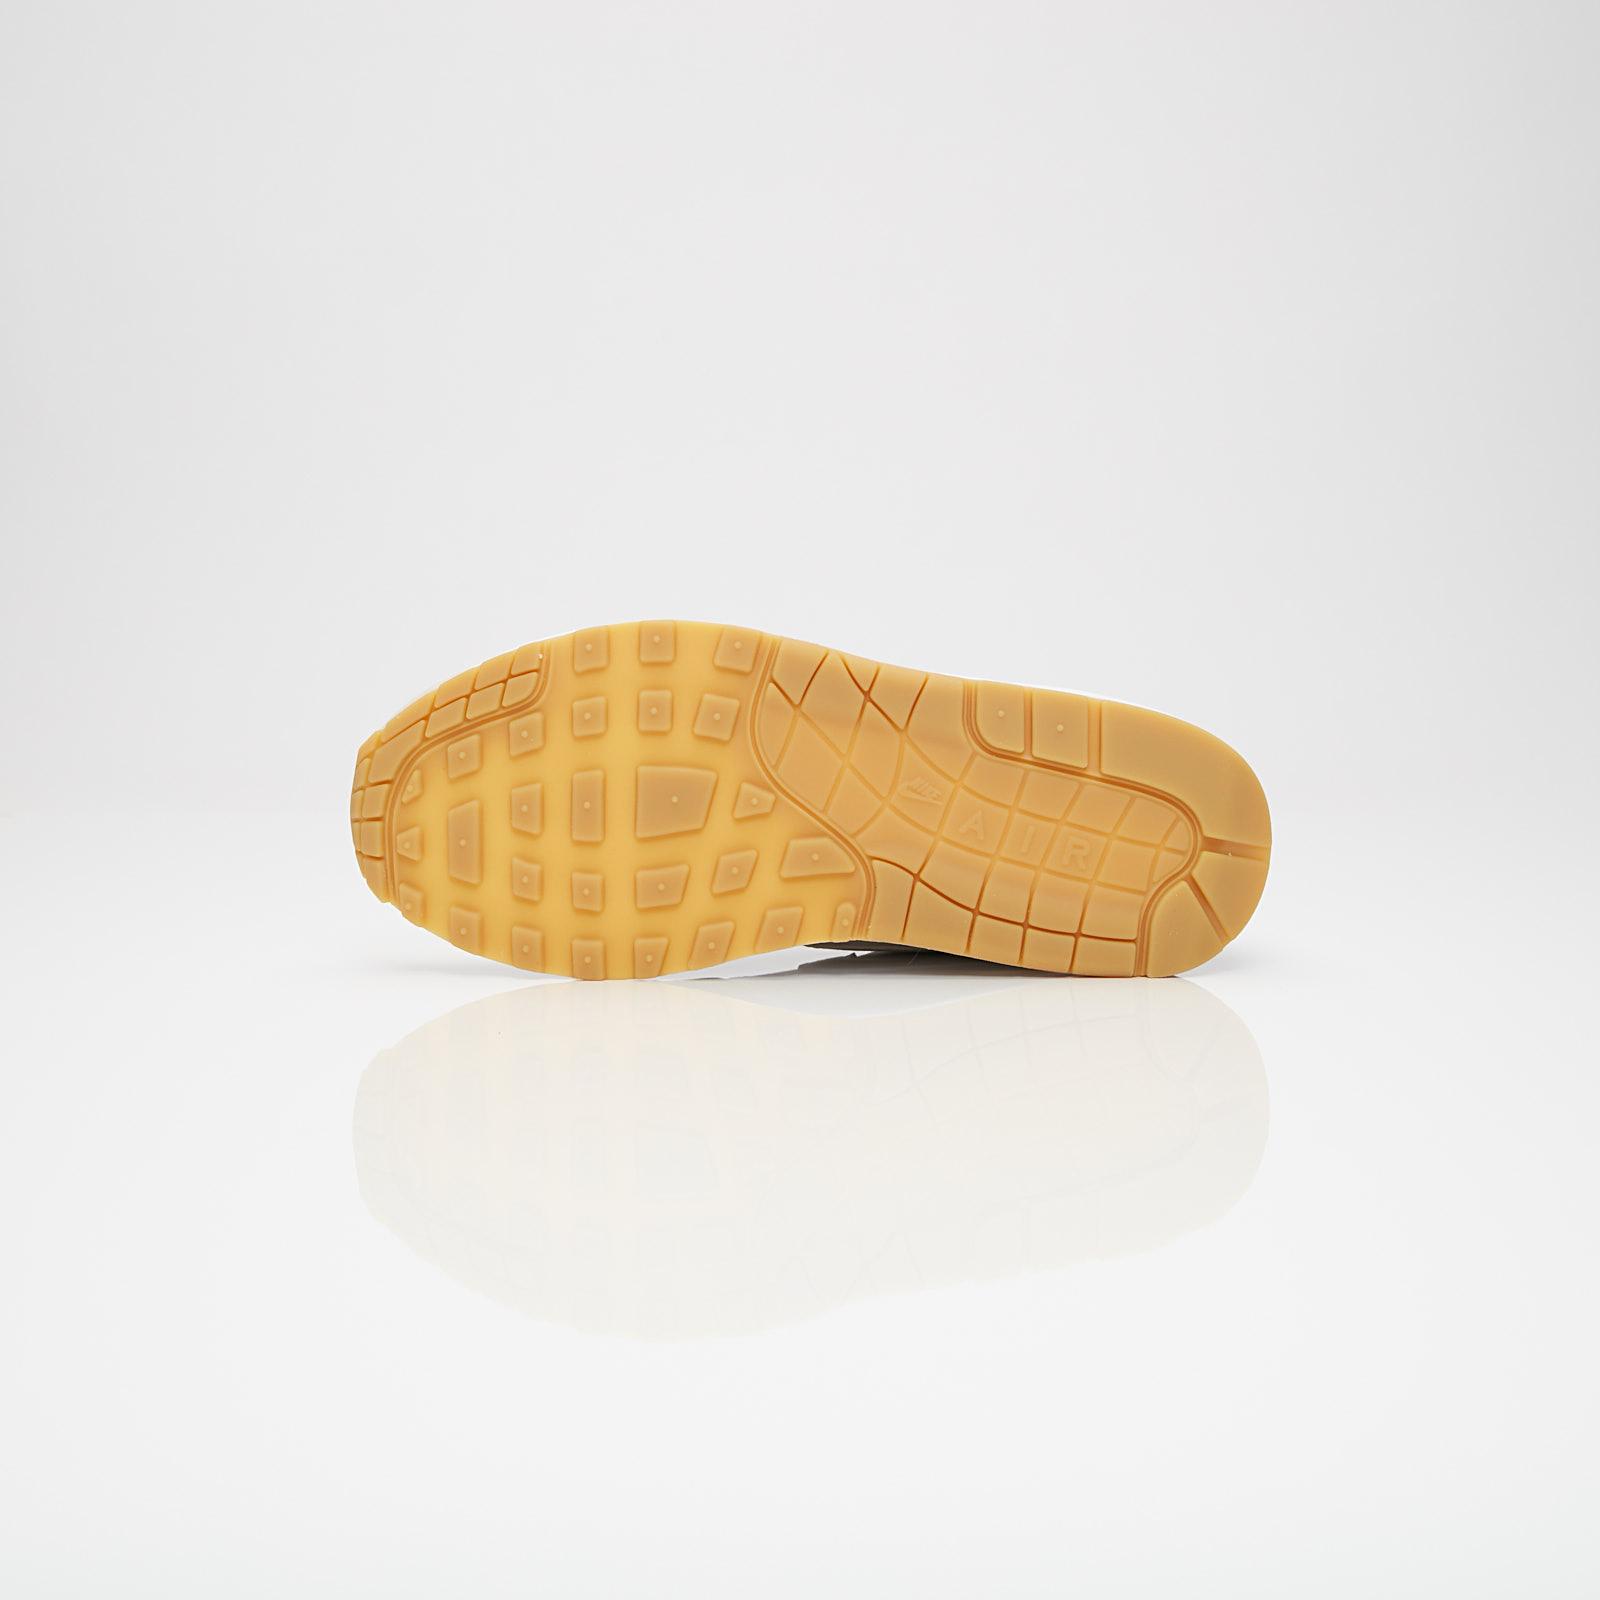 319986 036] Womens Nike Air Max 1 (Desert Sand, Gum Light